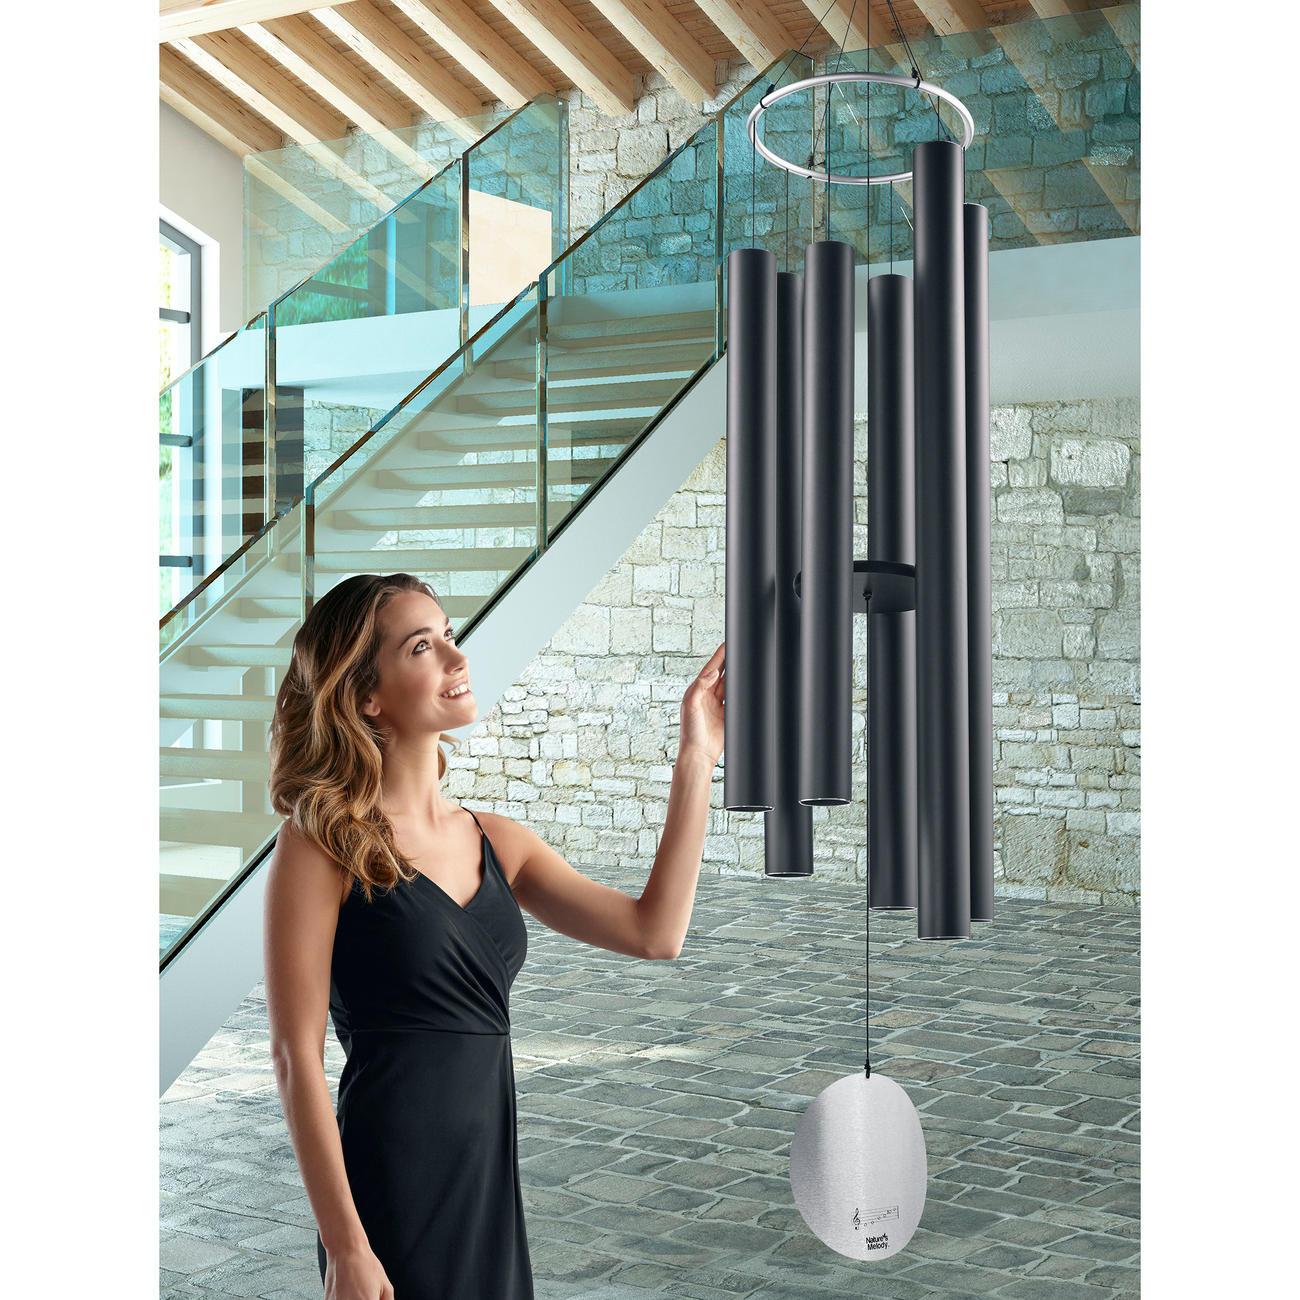 acheter aureole tunes ca 42 zoll 106 cm schwarz en ligne. Black Bedroom Furniture Sets. Home Design Ideas